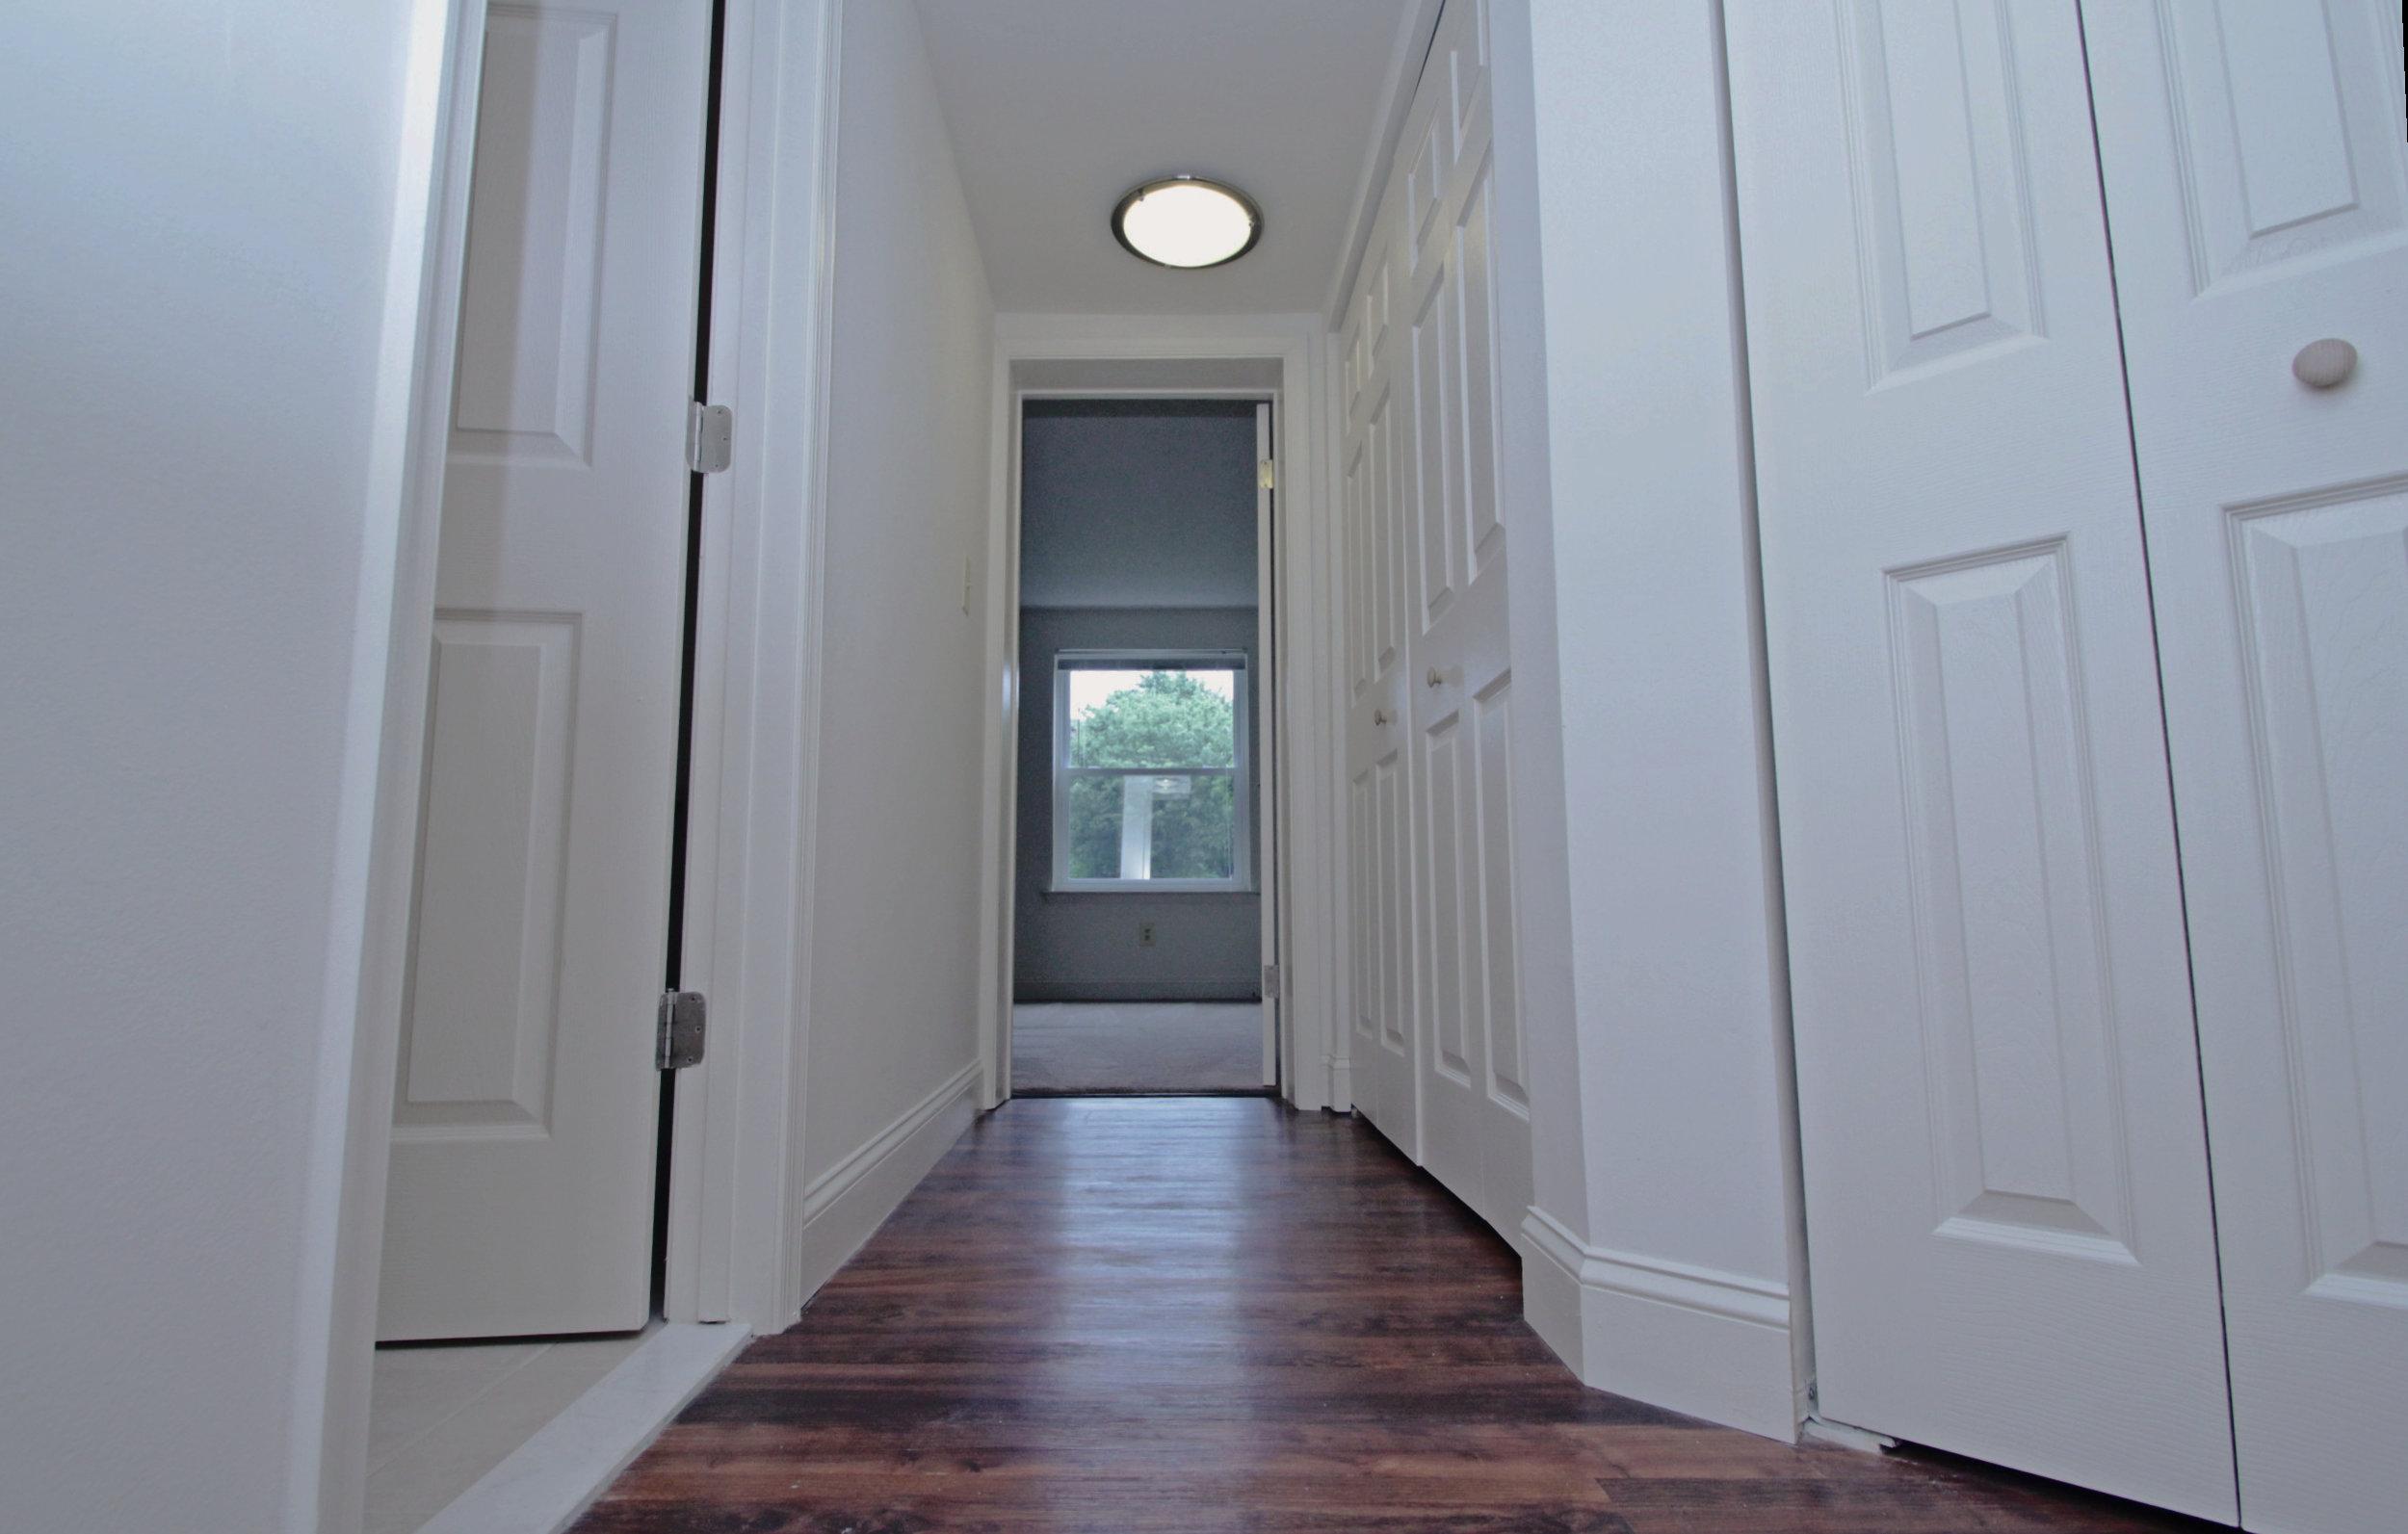 Contemporary Wood Grain Plank Flooring in Hallway